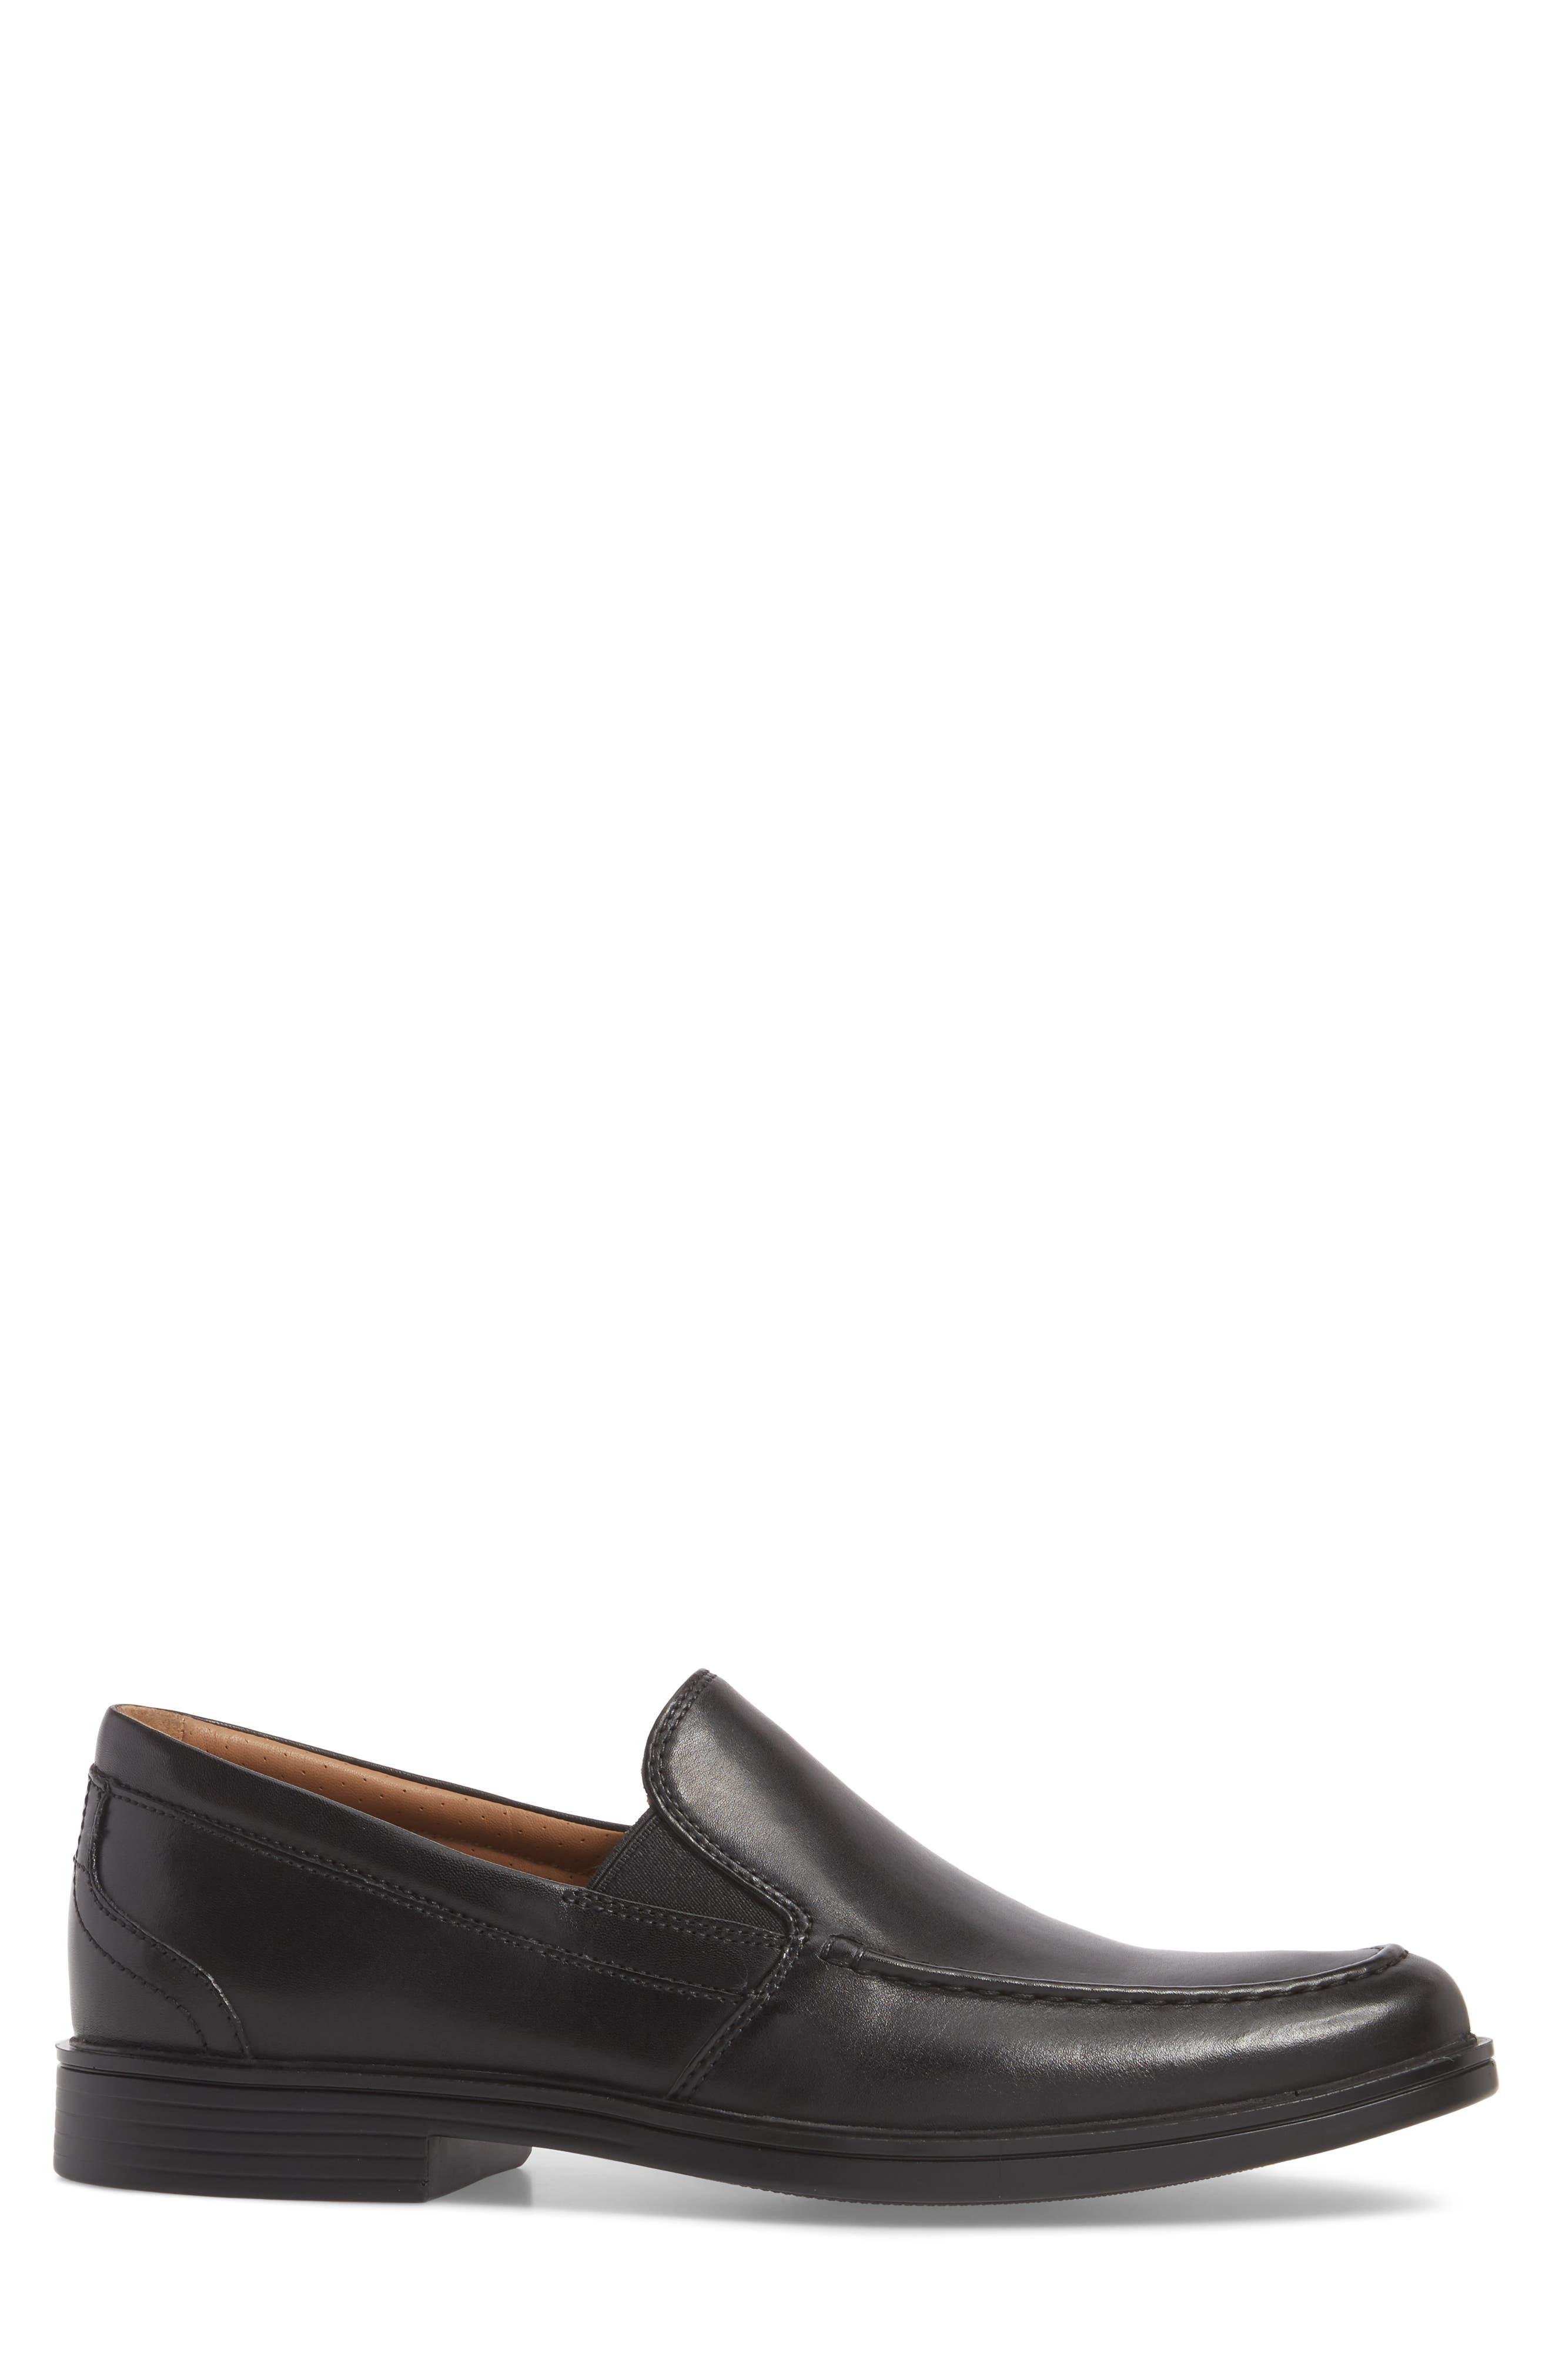 Unaldric Apron Toe Loafer,                             Alternate thumbnail 3, color,                             Black Leather